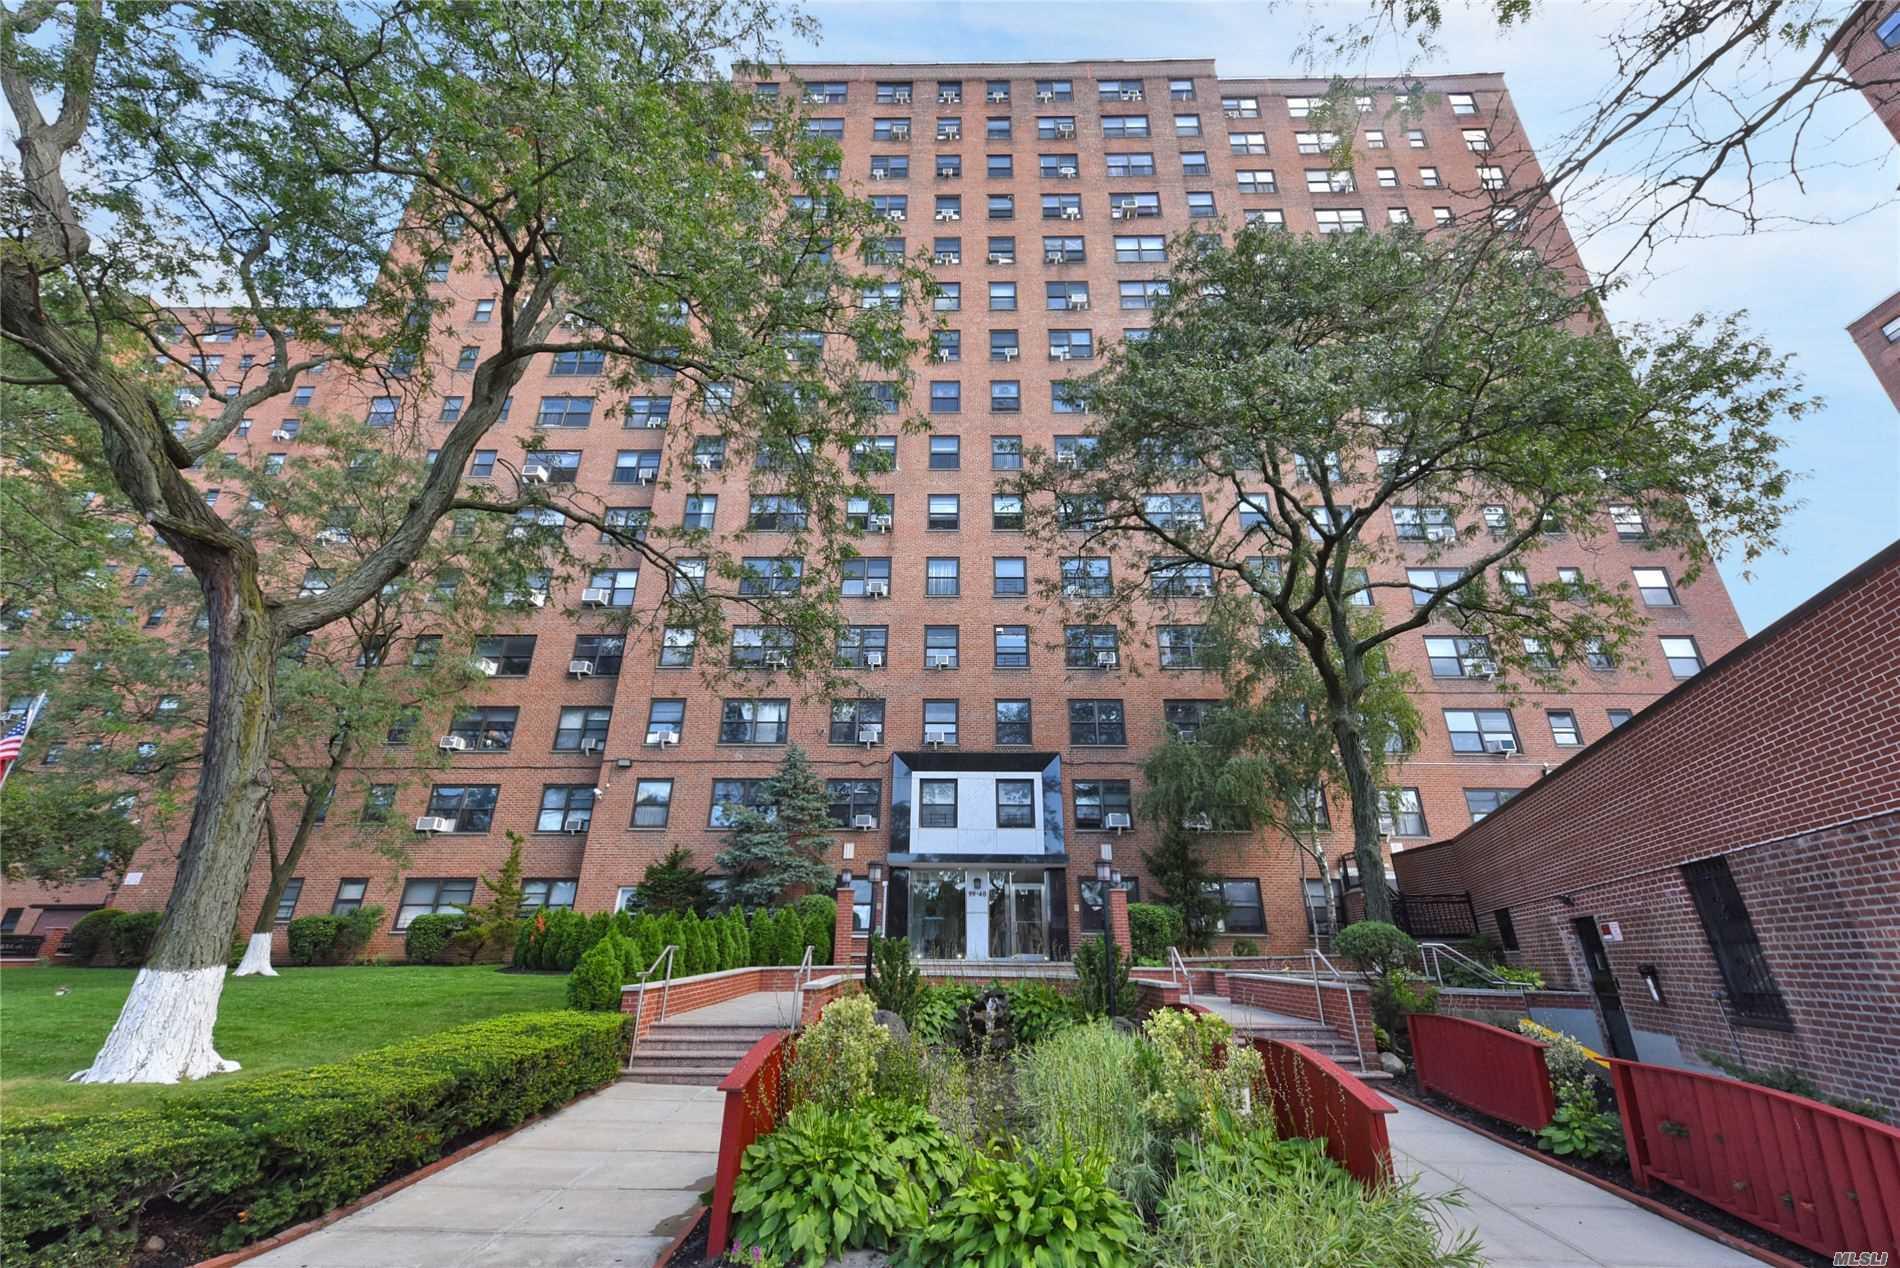 99-40 63rd Rd, 1F - Rego Park, New York